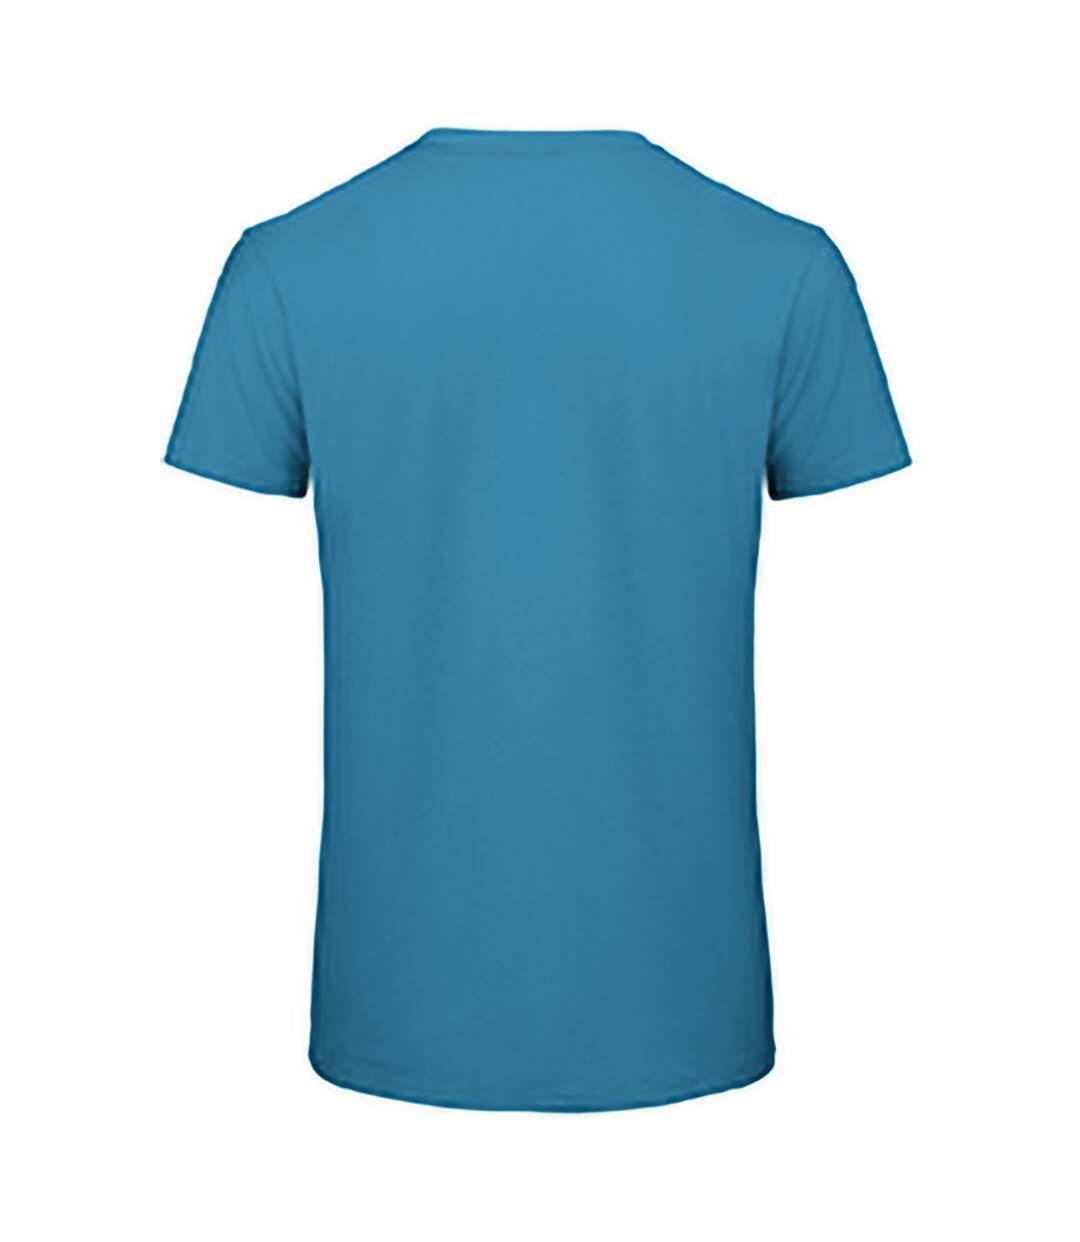 B&C Mens Favourite Organic Cotton Crew T-Shirt (Atoll) - UTBC3635